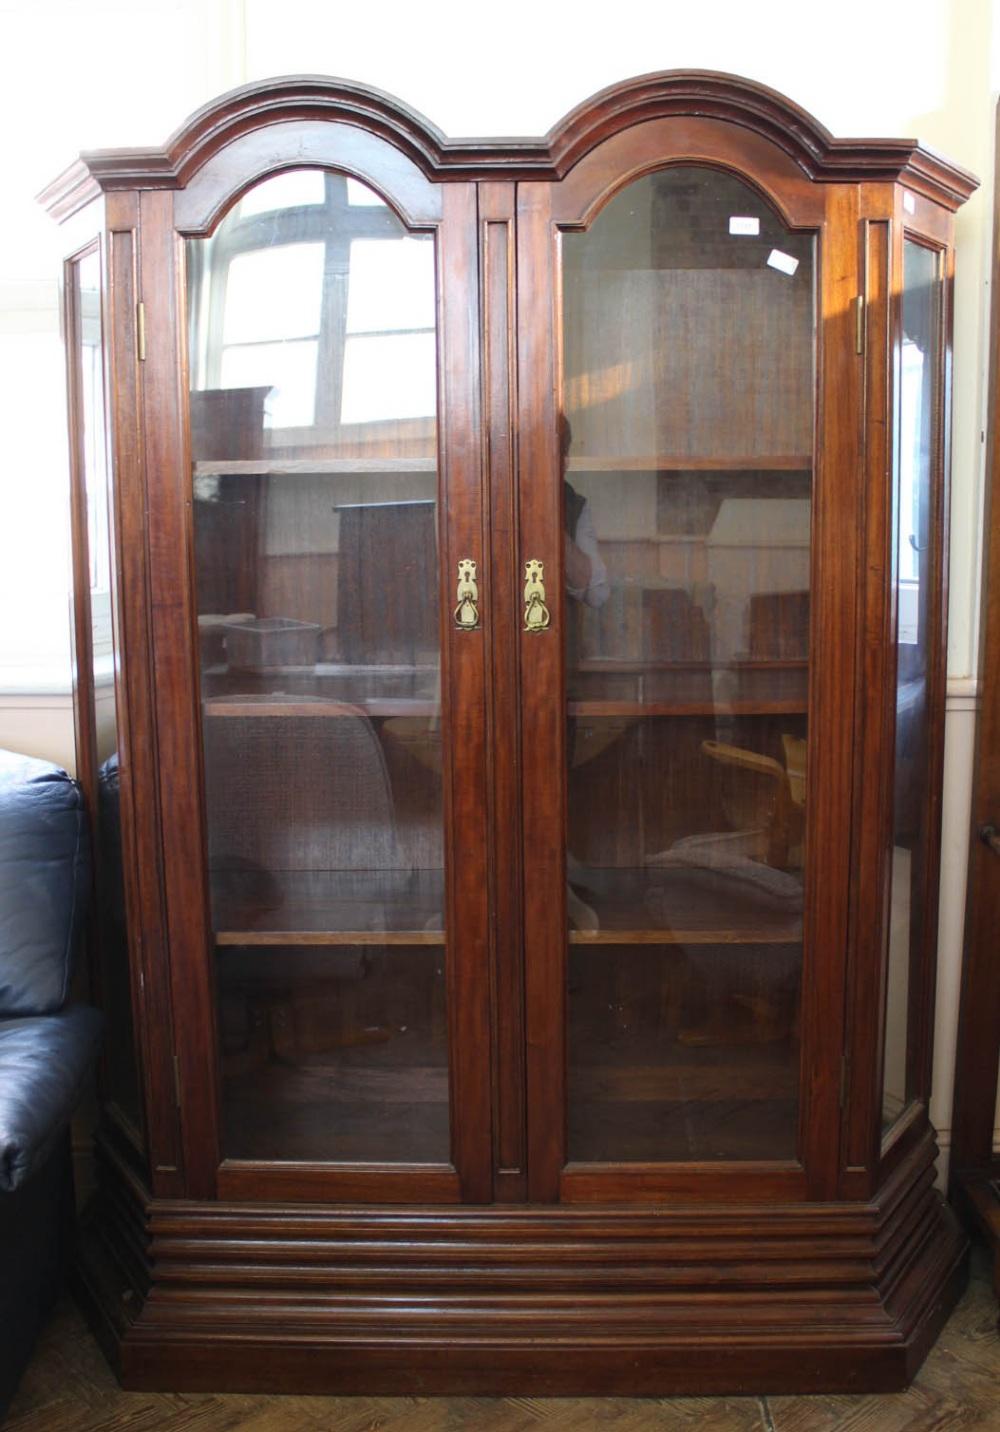 Lot 1031 - A substantial mahogany two door display cabinet